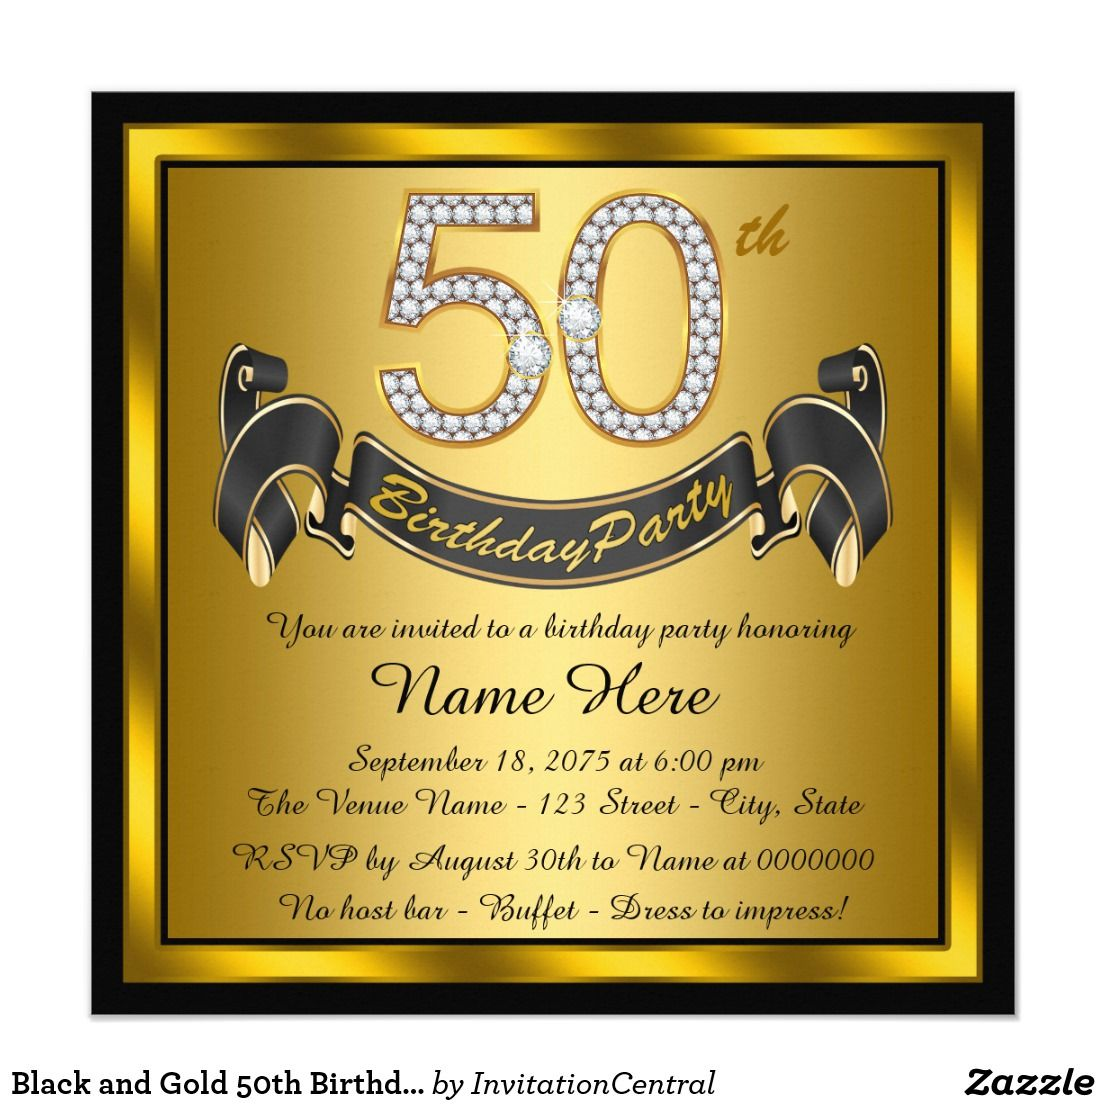 Black and Gold 50th Birthday Party Invitation   Zazzle.com   Personalized  birthday invitations, Birthday party invitation templates, 75th birthday  parties